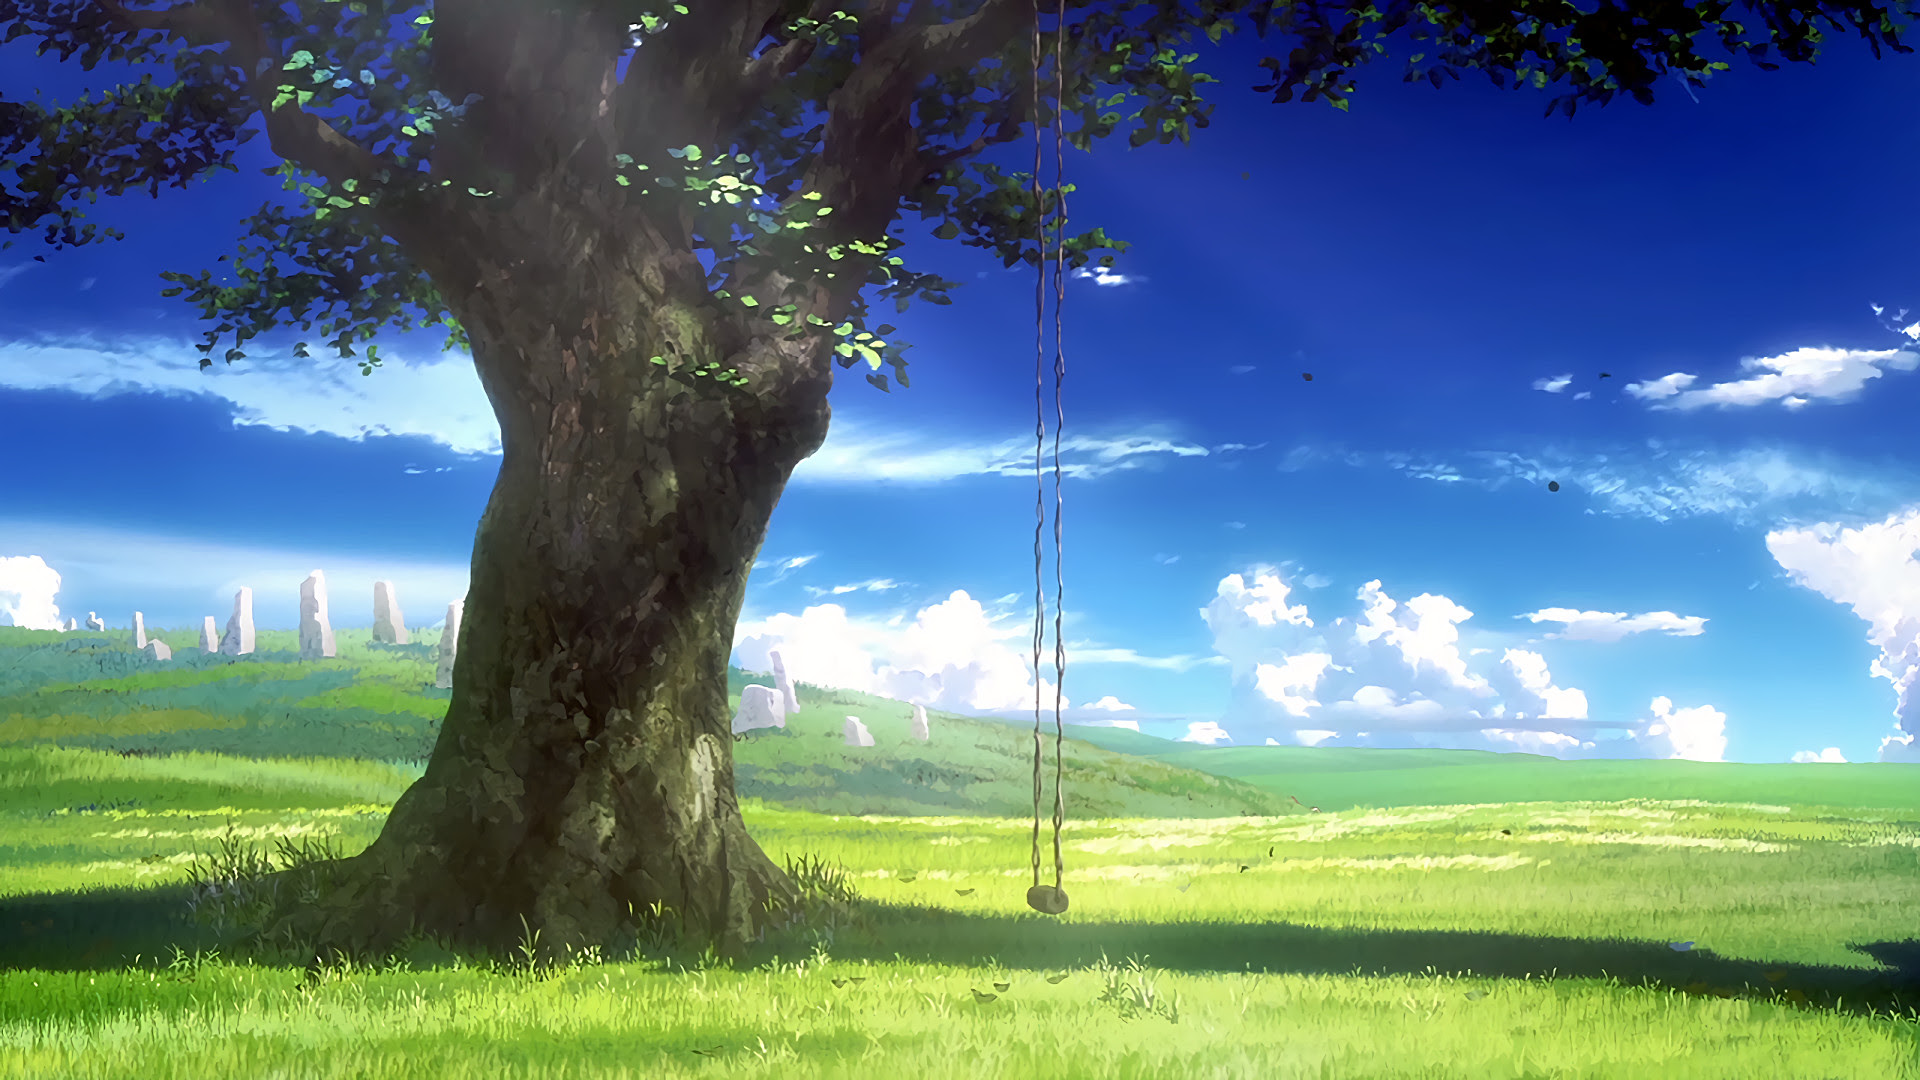 Anime Wallpaper Desktop Android 66 Anime Wallpapers Full Hd